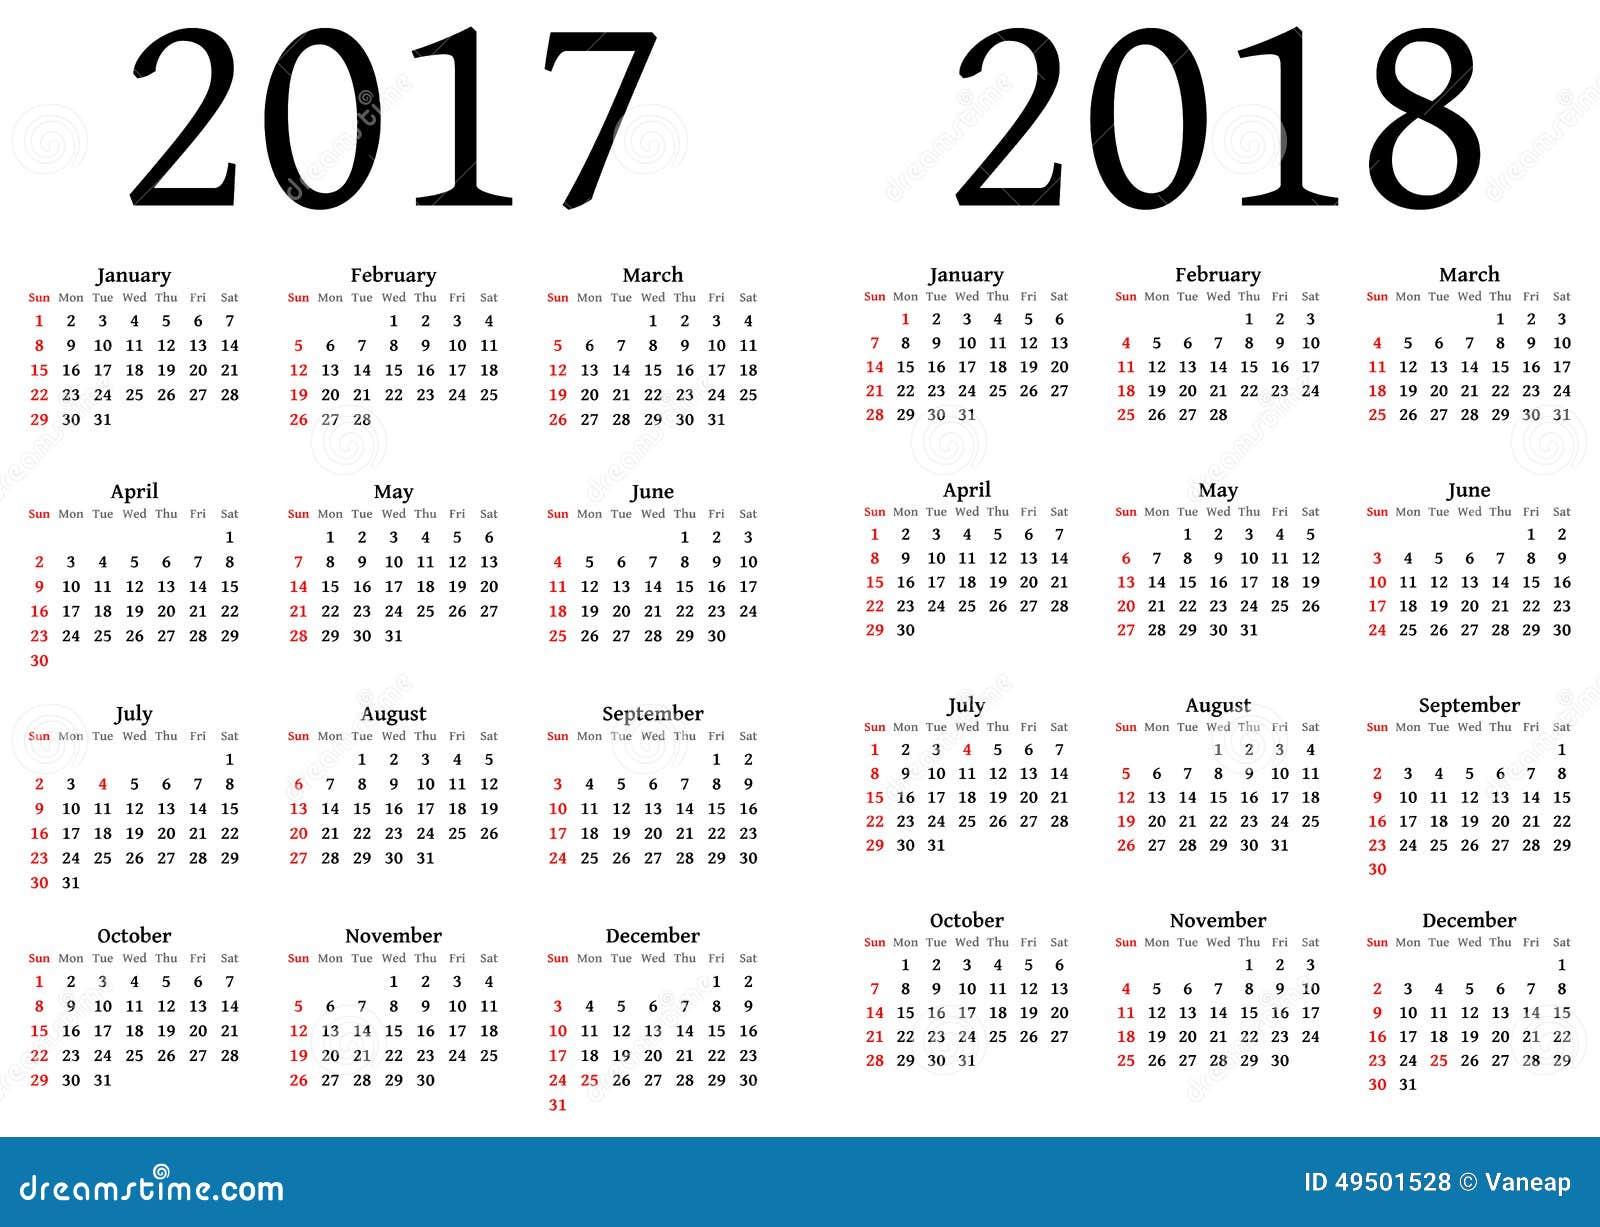 kalender f r 2017 und 2018 vektor abbildung bild 49501528. Black Bedroom Furniture Sets. Home Design Ideas